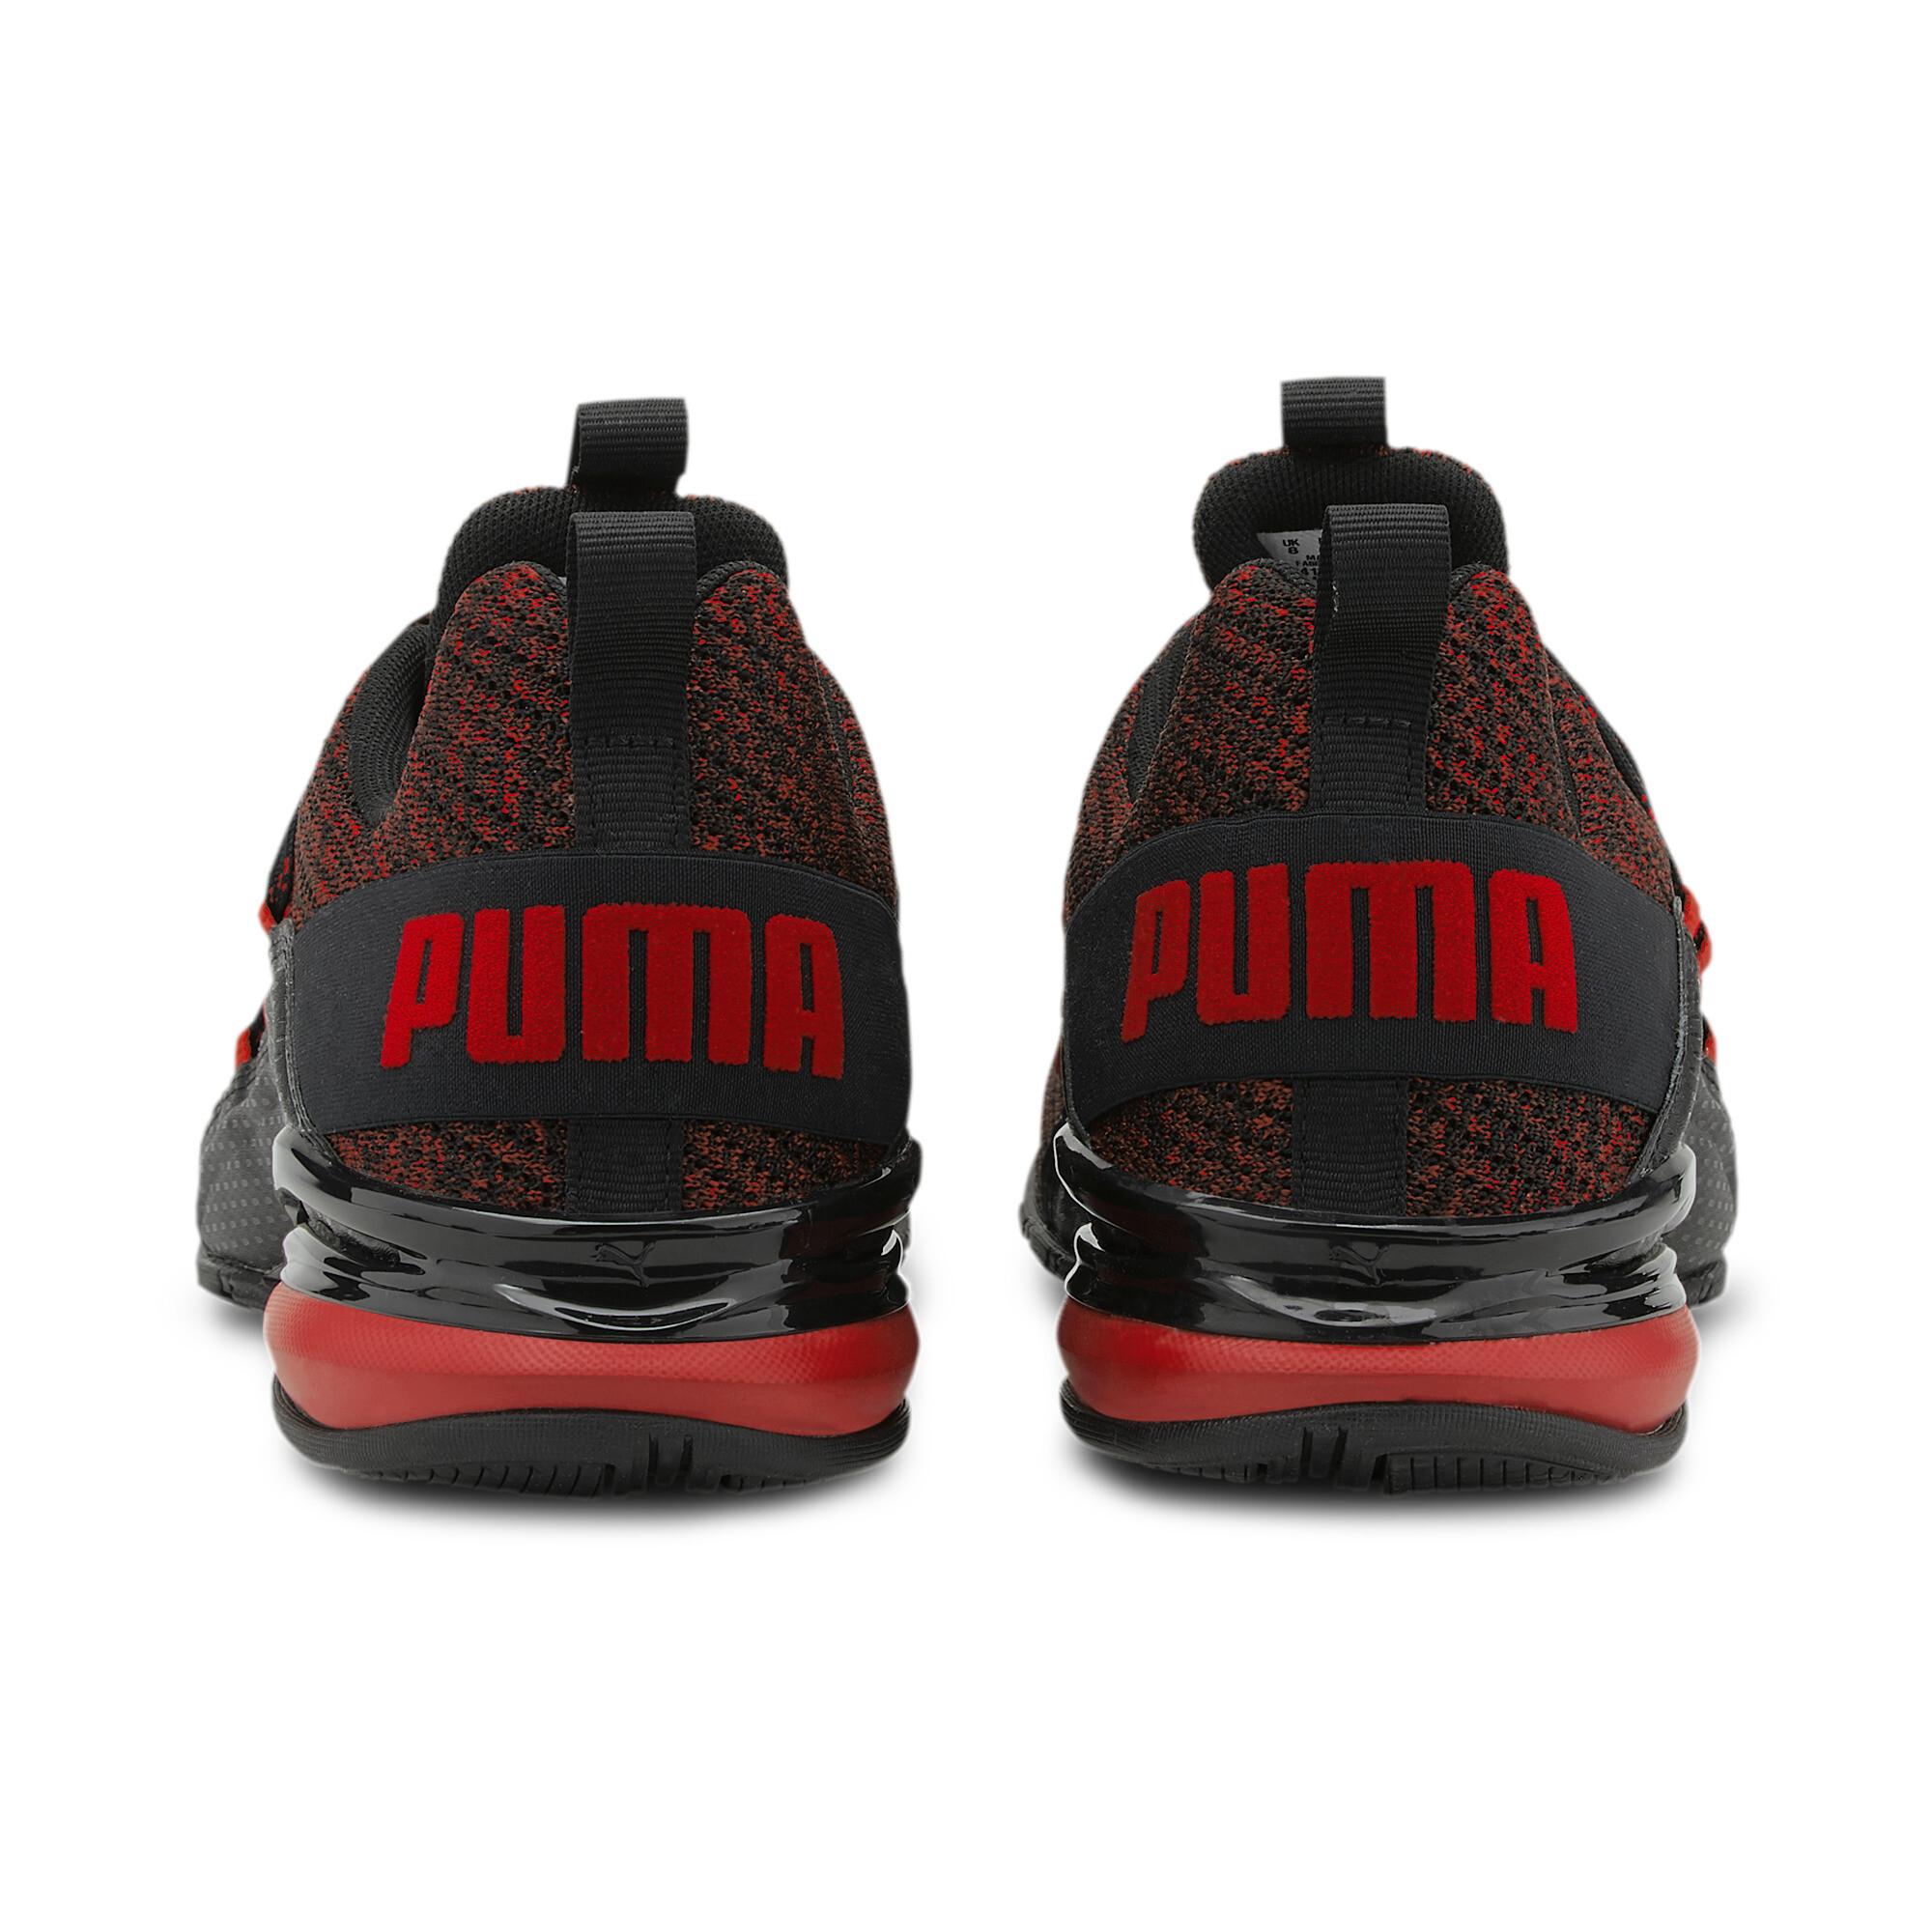 PUMA-Men-039-s-Axelion-Ultra-Running-Shoes thumbnail 3